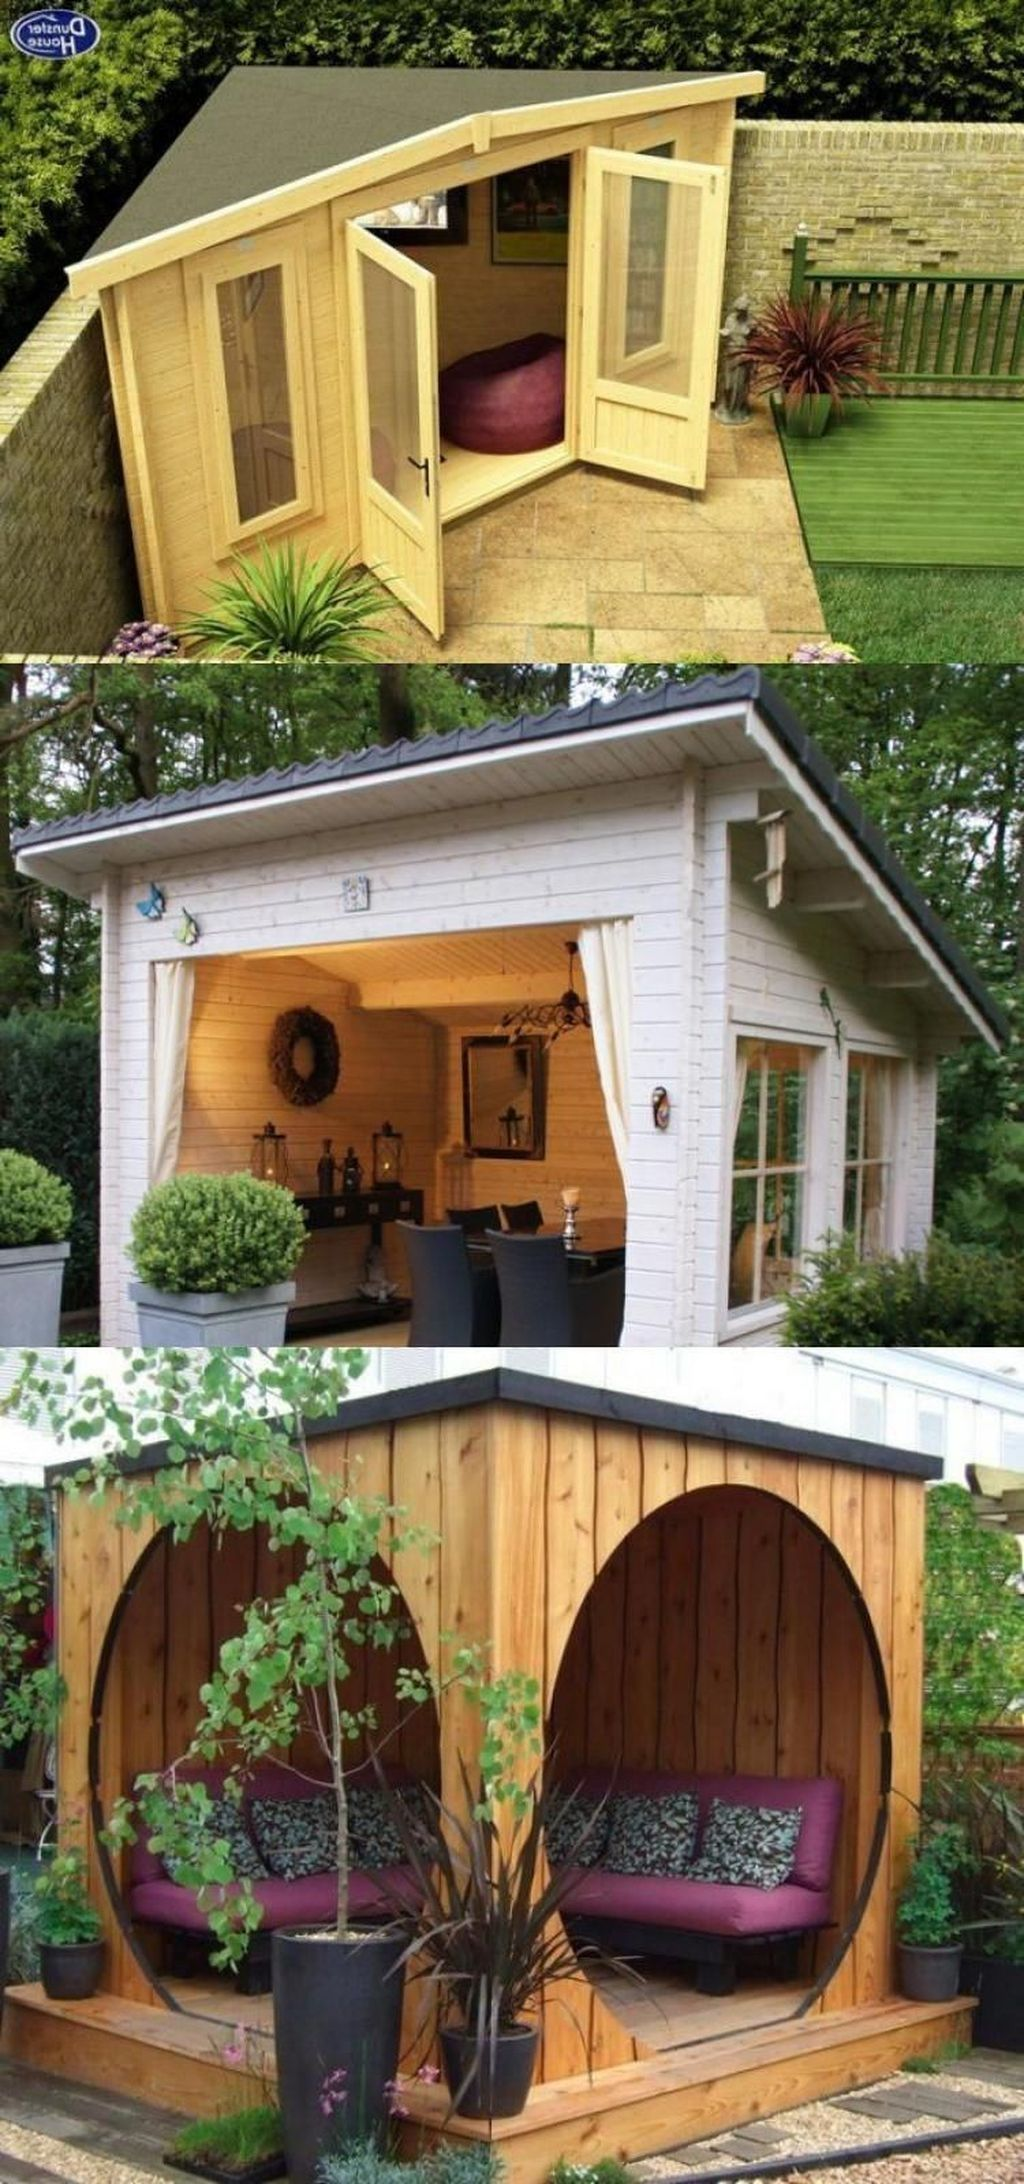 30 Stylish Gazebo Design Ideas For Your Backyard A Gazebo Can